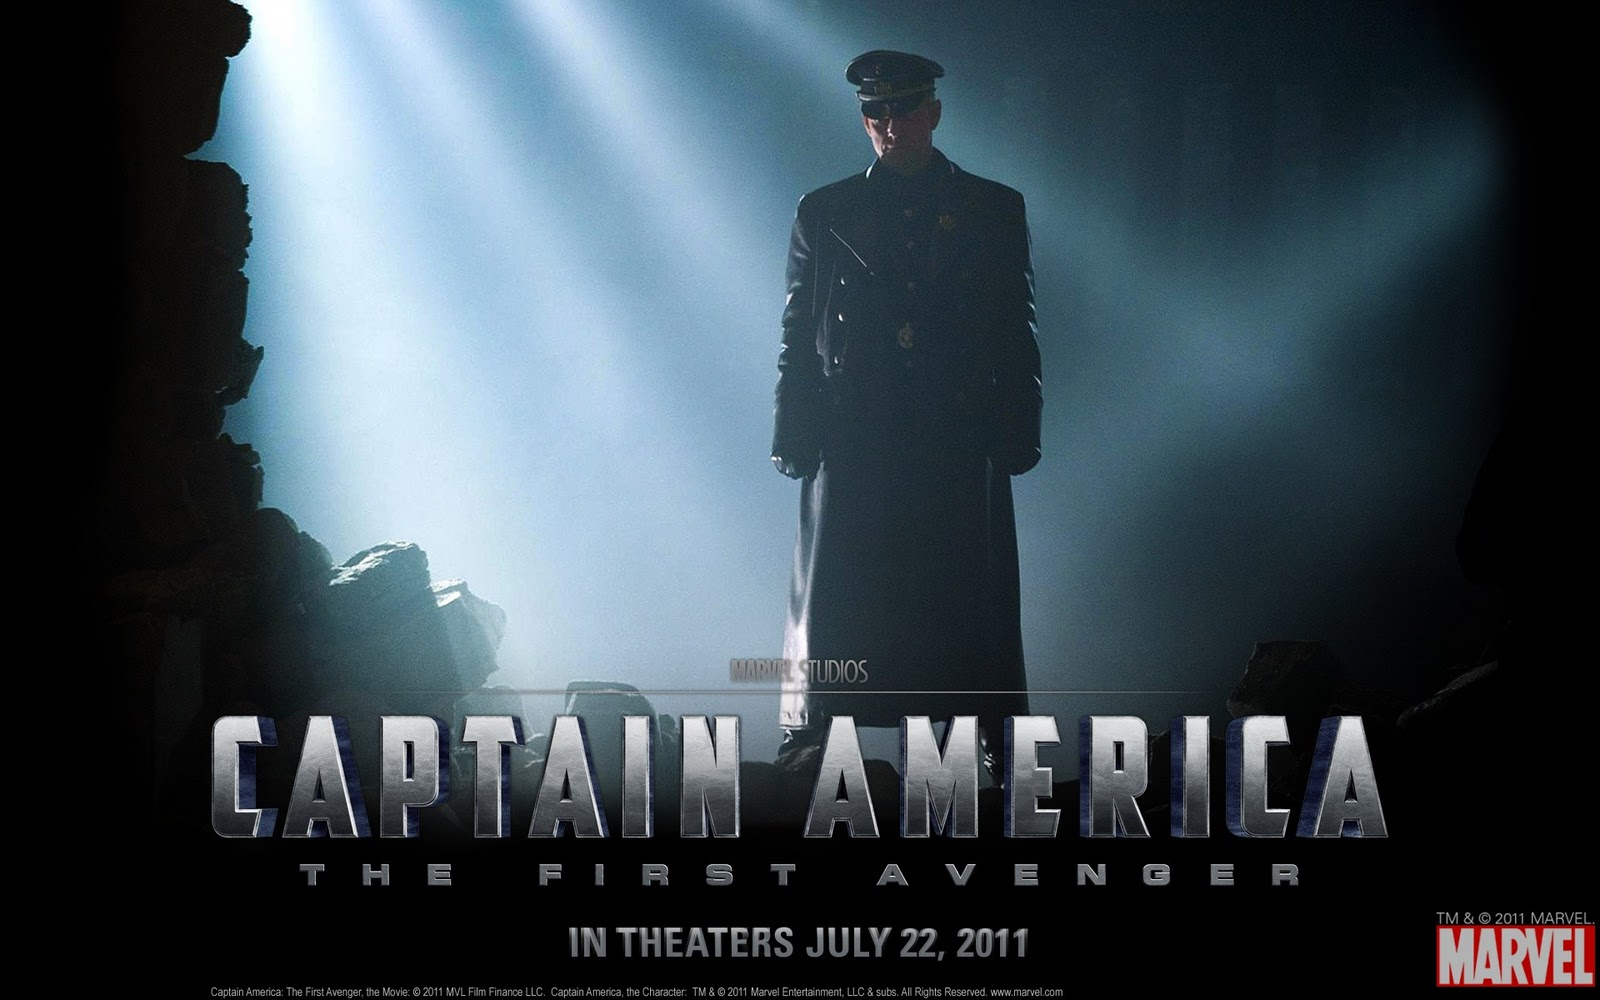 http://3.bp.blogspot.com/-mFS230qQ3Mo/TrJLg7jyifI/AAAAAAAAI8w/PcVAI6gwJXE/s1600/movie+wallpaper_captain+america_04.jpg